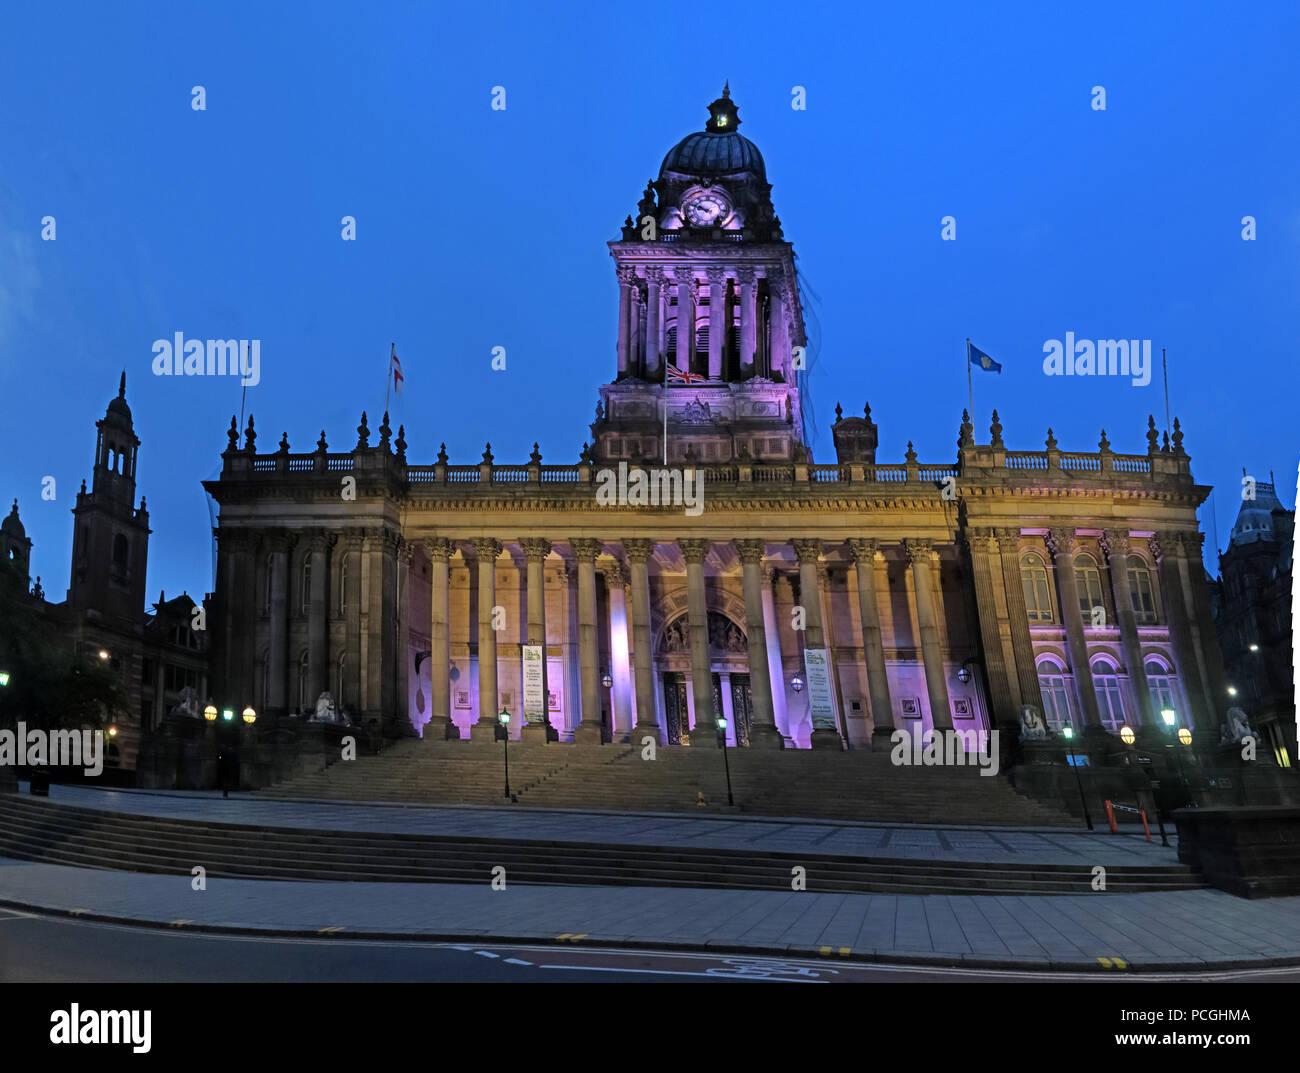 GoTonySmith,@HotpixUK,Leeds England,Yorkshire,City Centre,Leeds night,dusk,night,leeds at night,nighttime,dawn,West Yorkshire,architecture,streets,urban,after dark,Leeds after dark,Yorkshire after dark,county of West Yorkshire,LS1,Leeds City Council,Council,Leeds City Hall,City Hall,Town Hall,Leeds Townhall,public hall,law courts,hall,public,council,council building,Brodrick,tallest building in Leeds,clock tower,Leeds Town Hall Clock Tower,civic,Corinthian columns